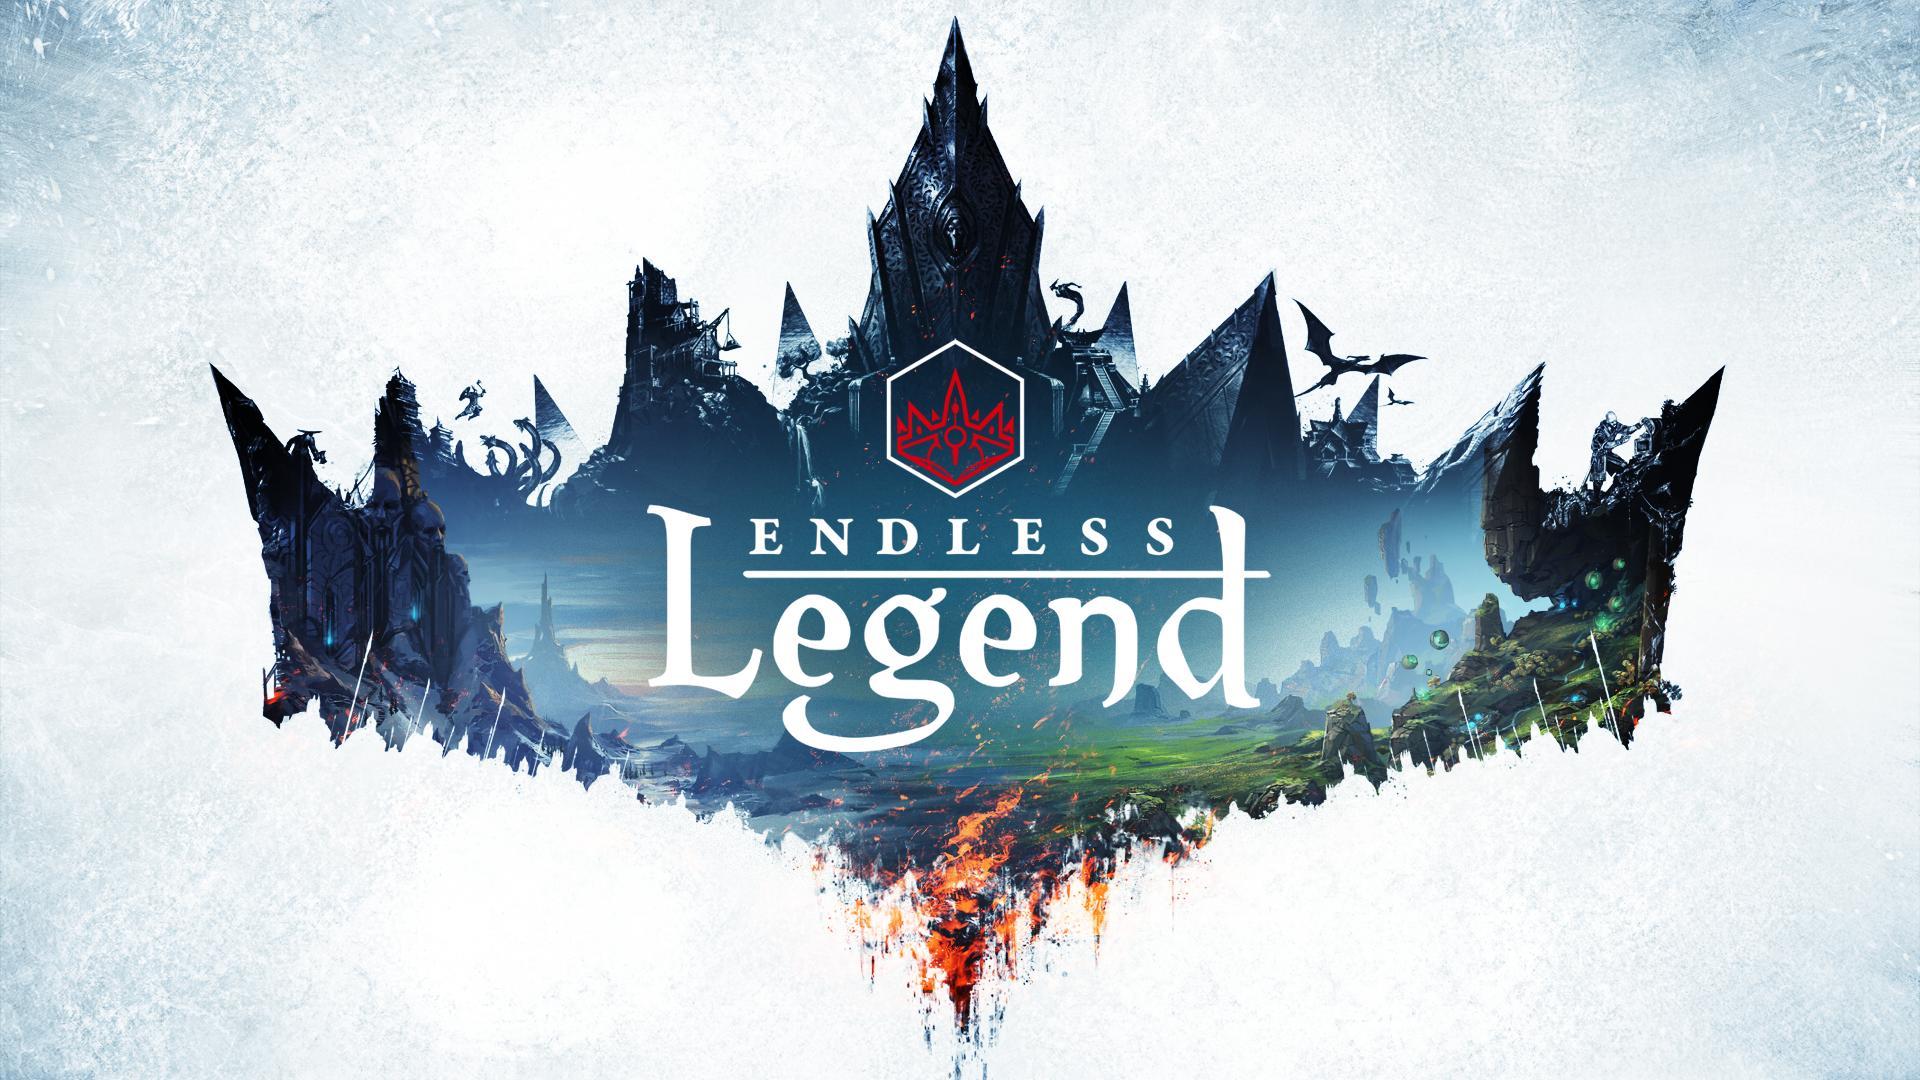 Endless-Legend-120115 logo